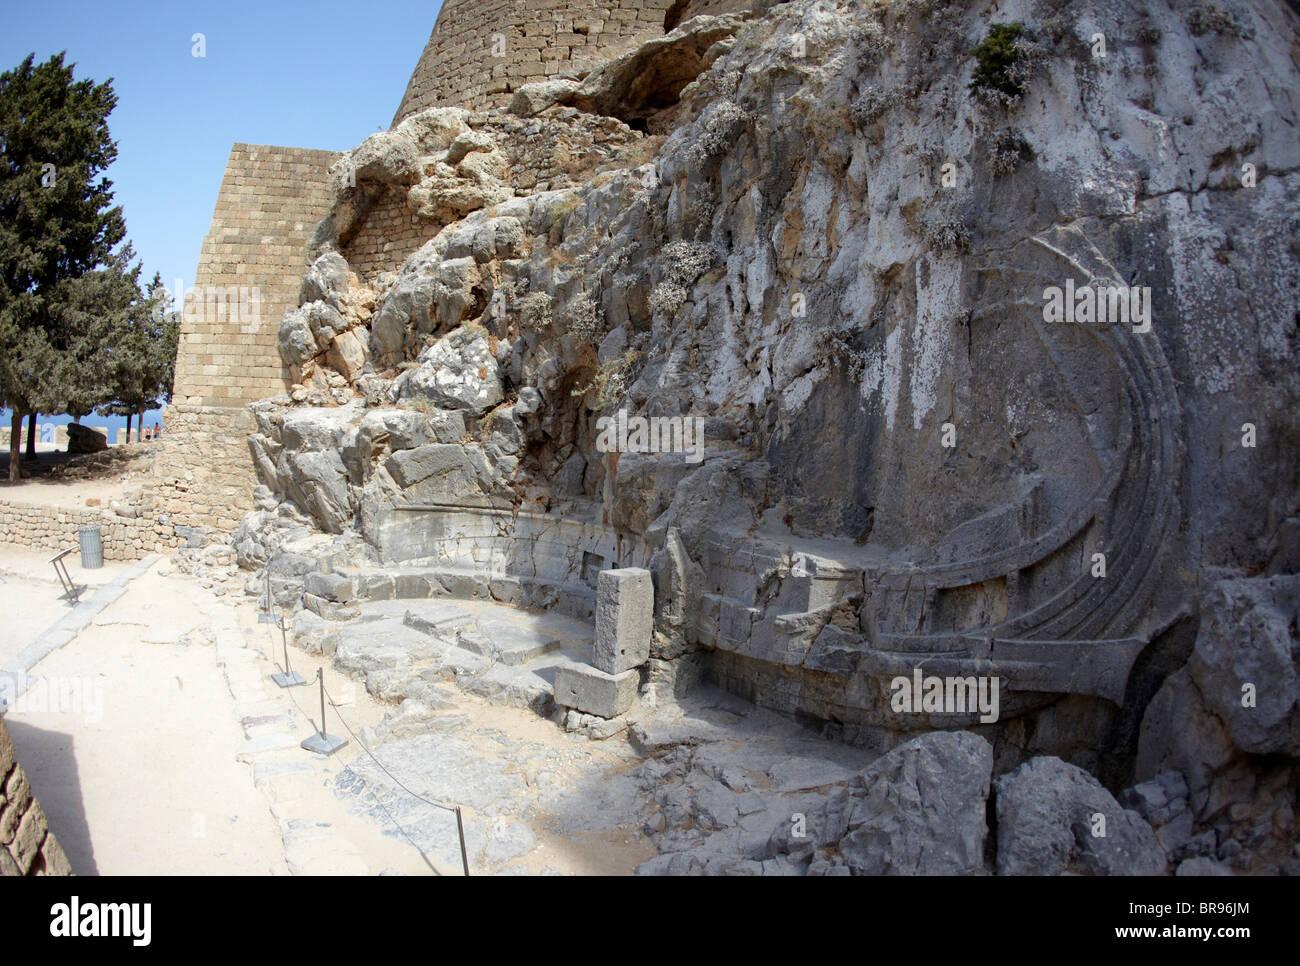 Relief Of  A Rhodian Trireme Warship The Acropolis Lindos Rhodes Greek Islands Hellas - Stock Image